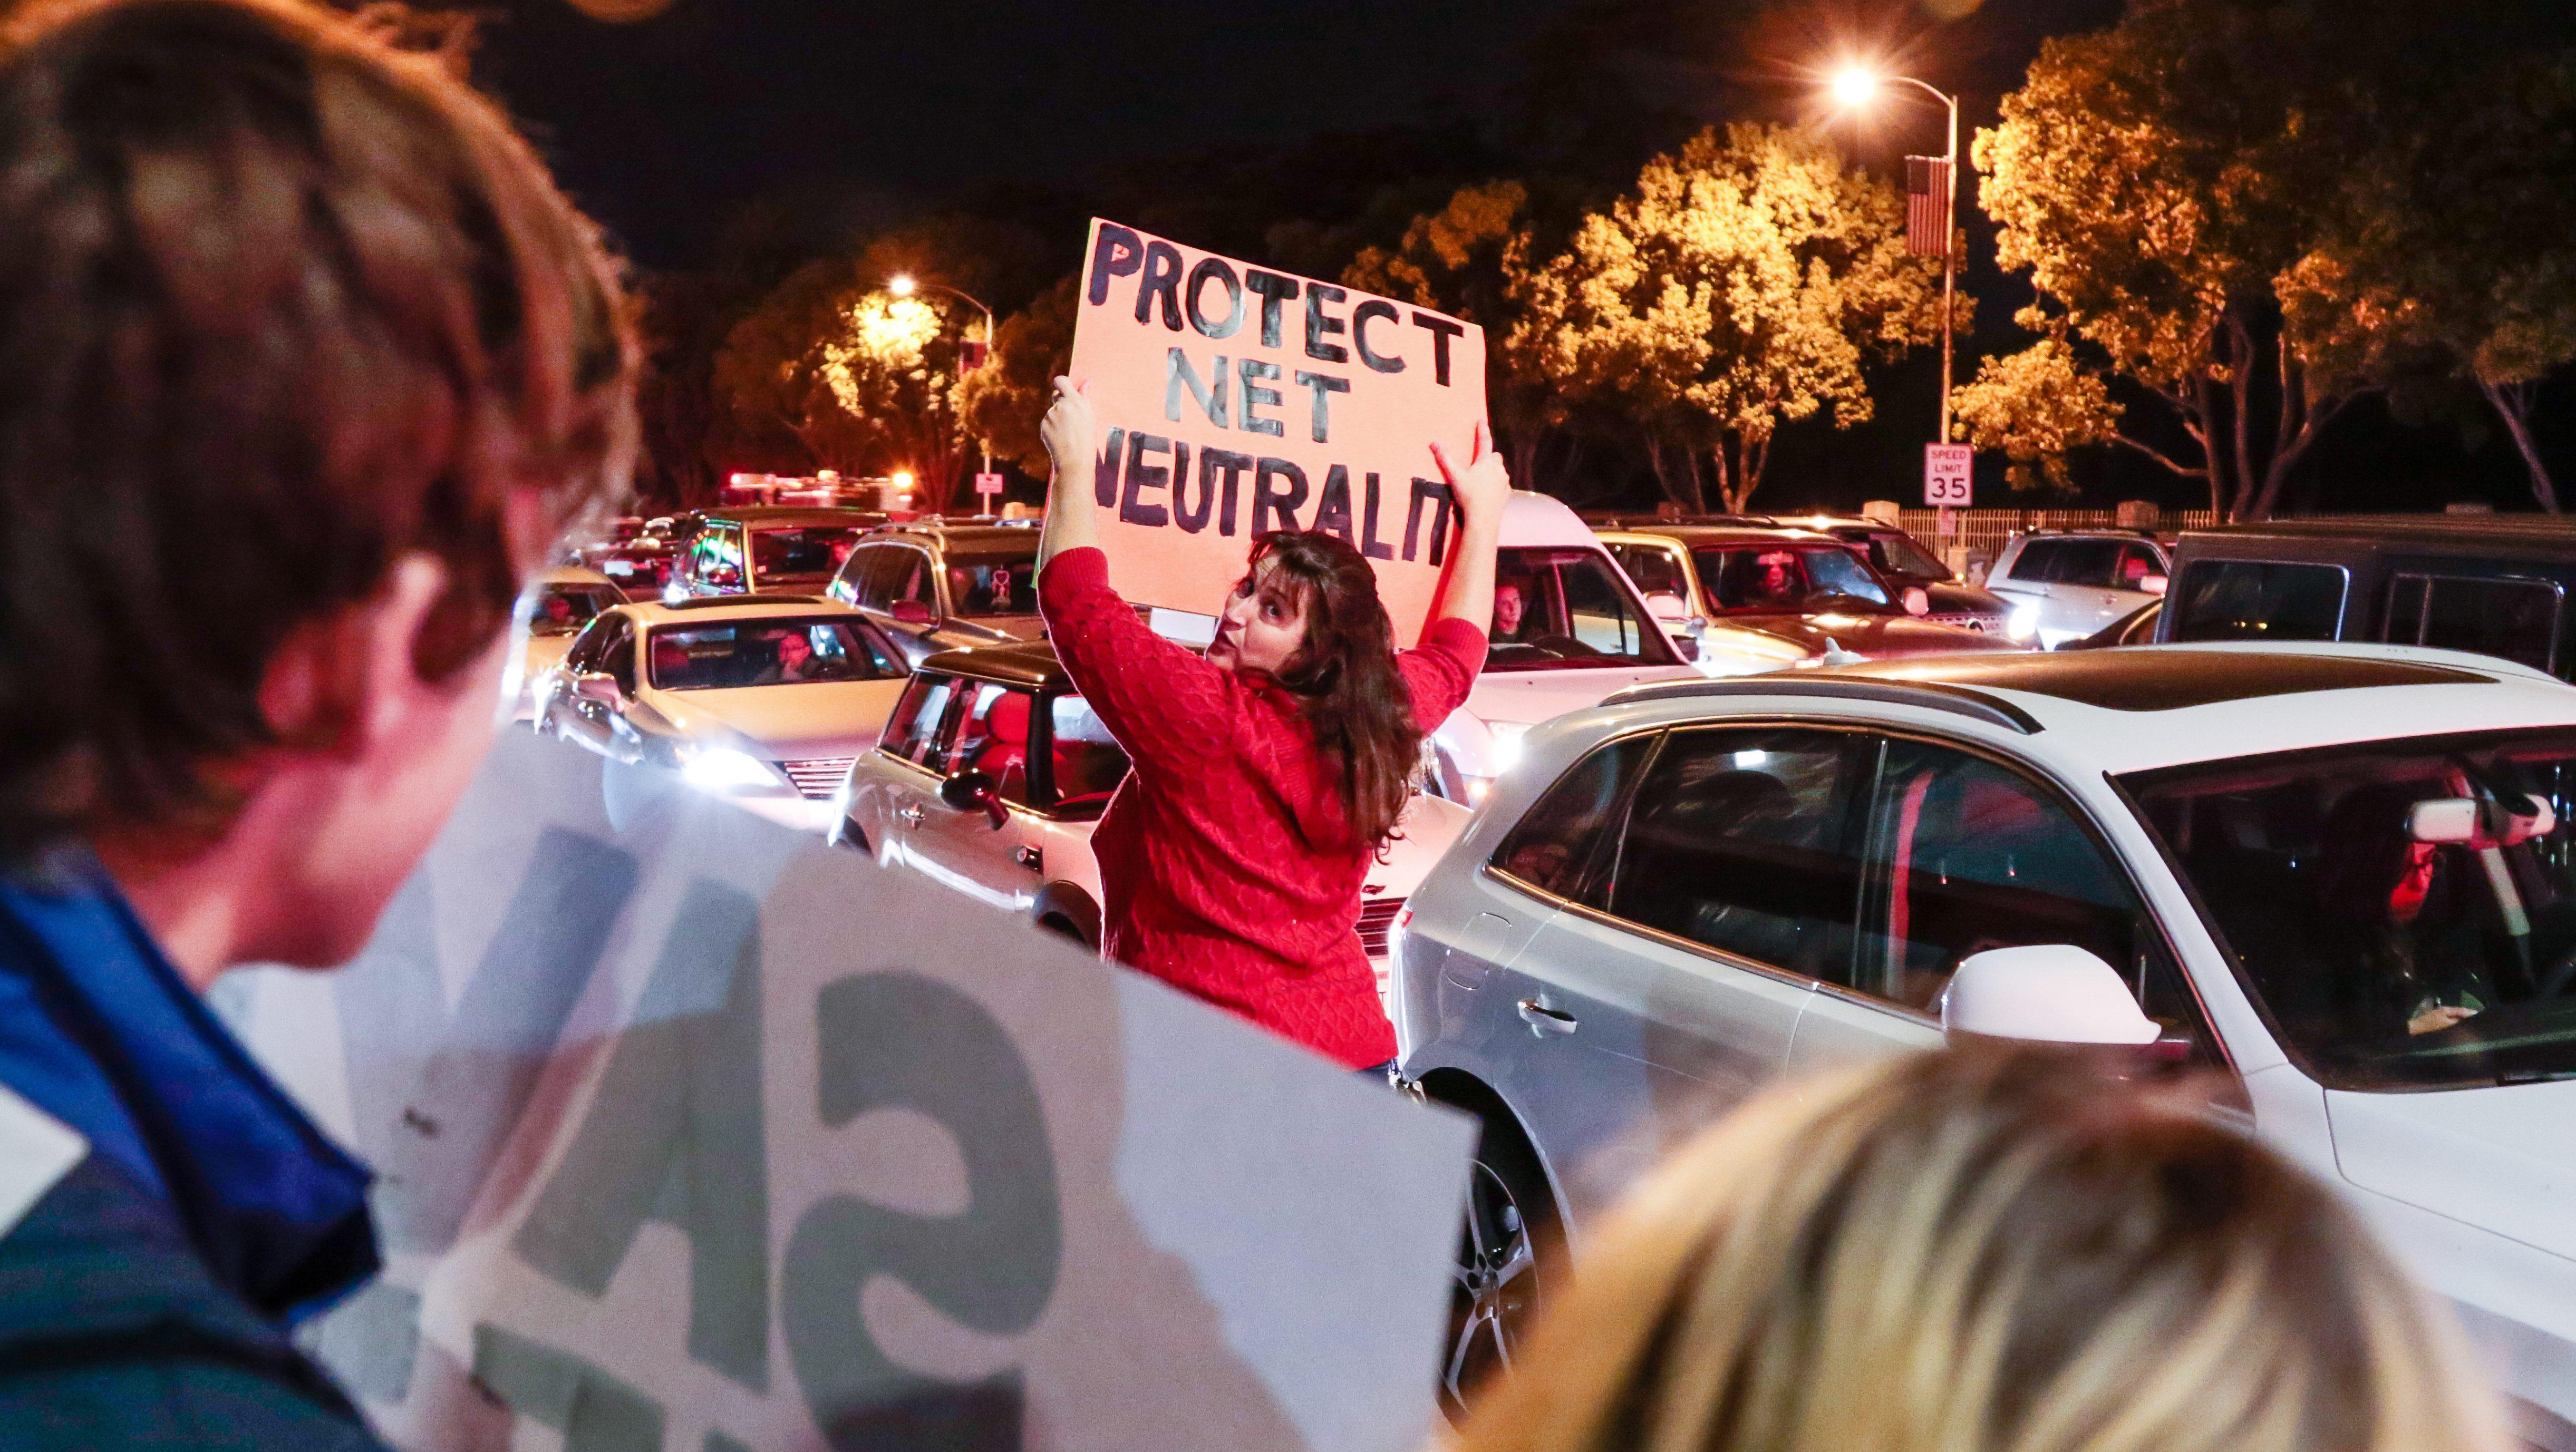 Net Neutrality advocates gather in Valley Glen, California, November 28.